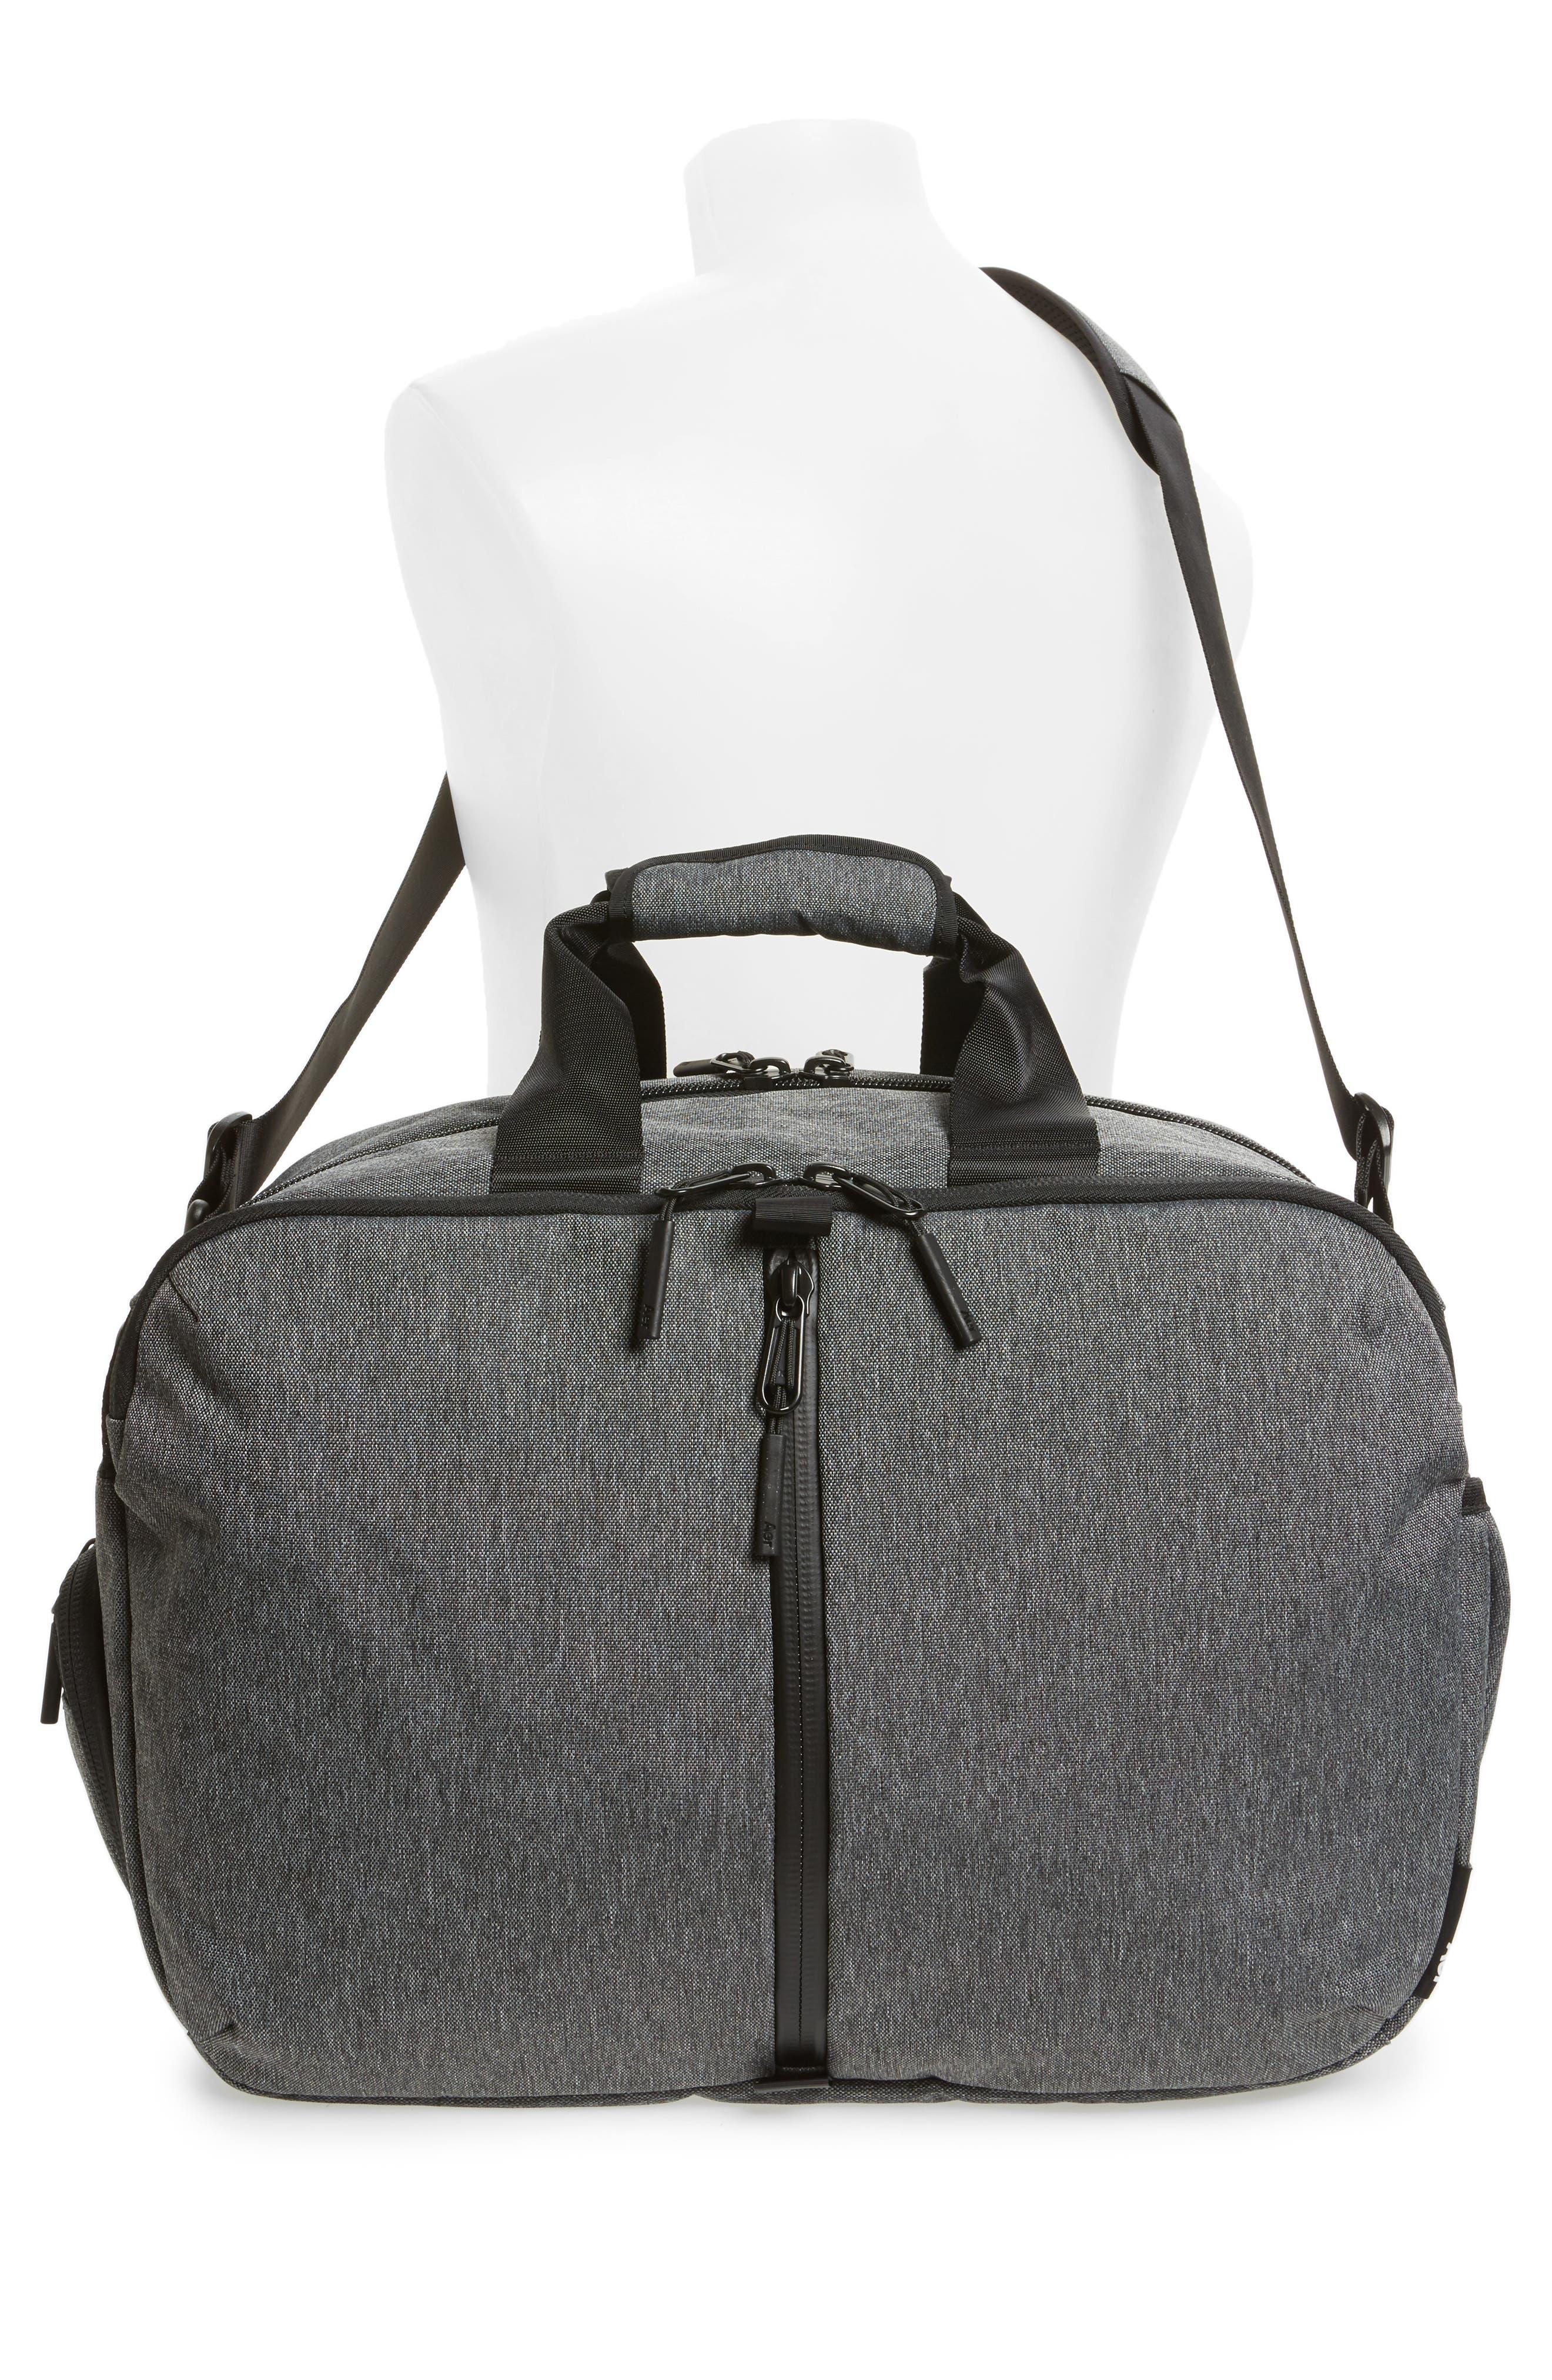 Alternate Image 2  - Aer Gym Duffel 2 Bag